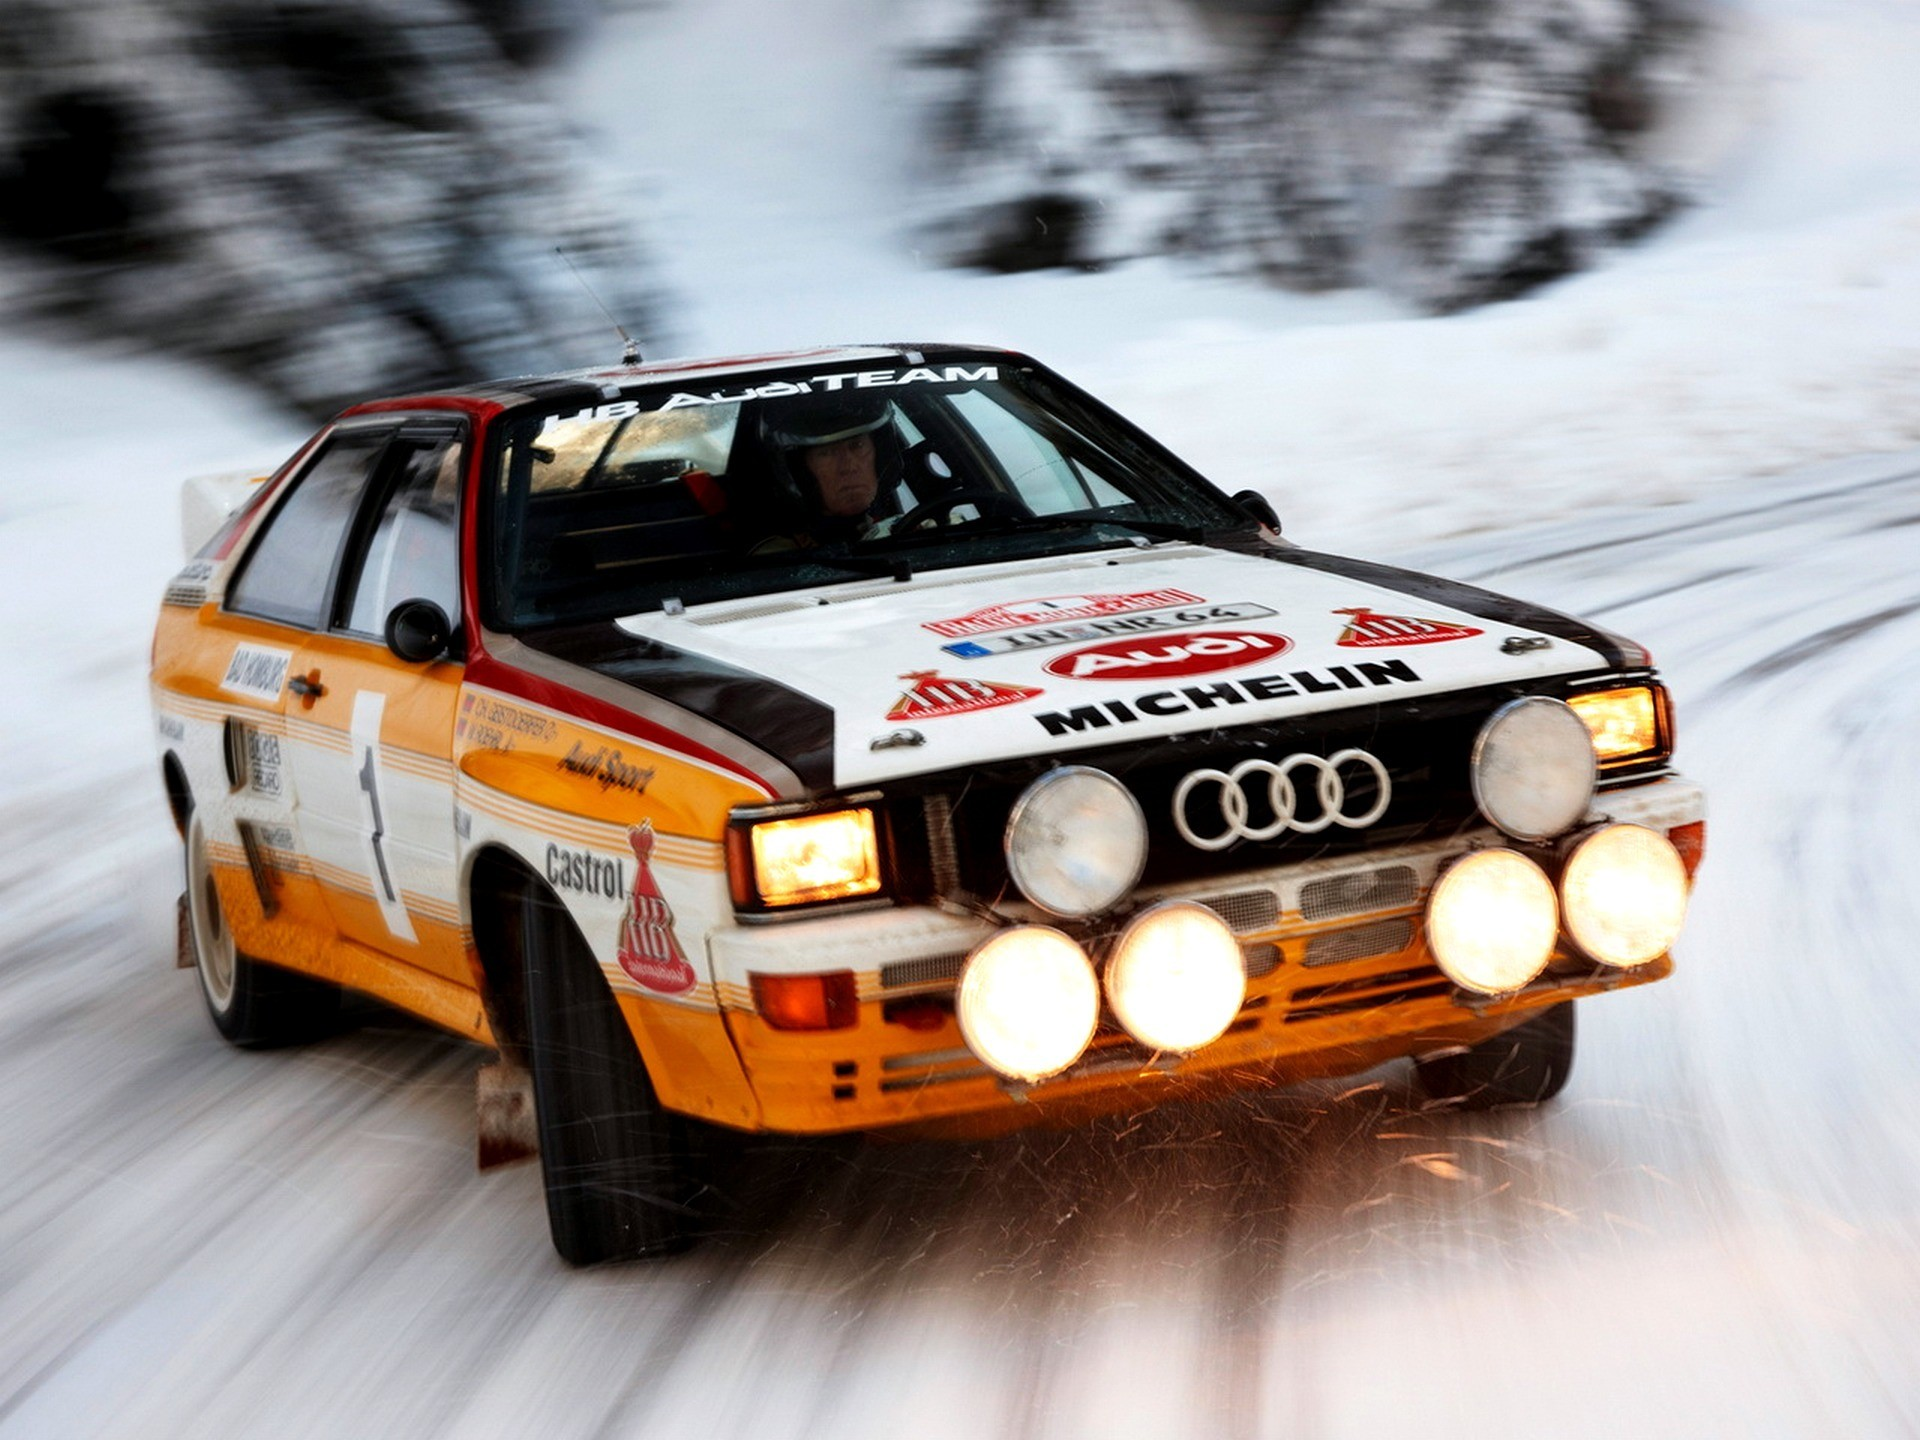 Snow Rally Audi Quattro Speed Rally Car Wallpaper 1920x1440 193464 Wallpaperup